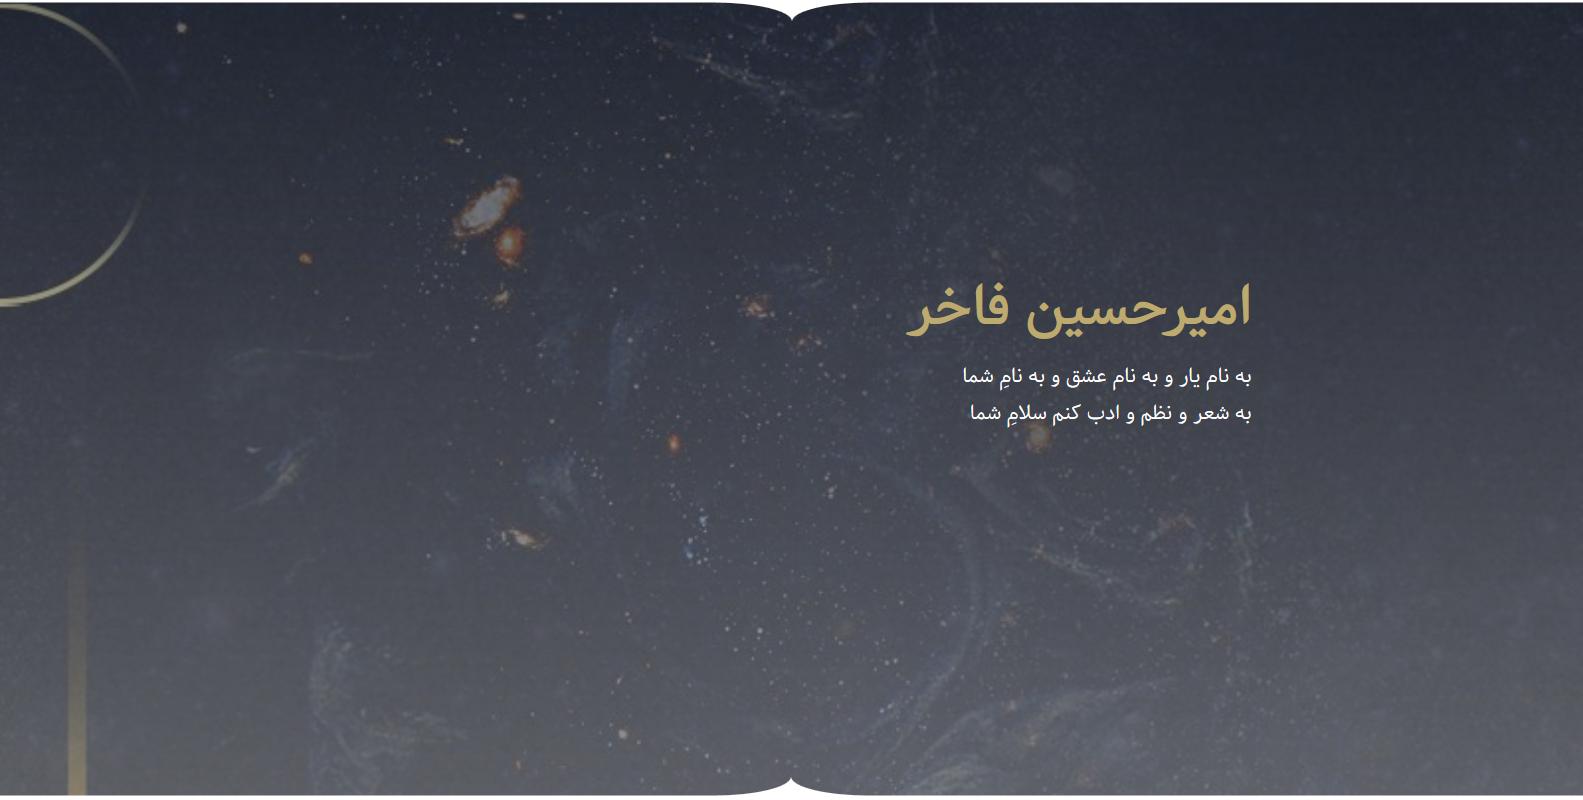 Screenshot_2020-06-06 امیر فاخر - وب سایت شخصی امیرحسین فاخر